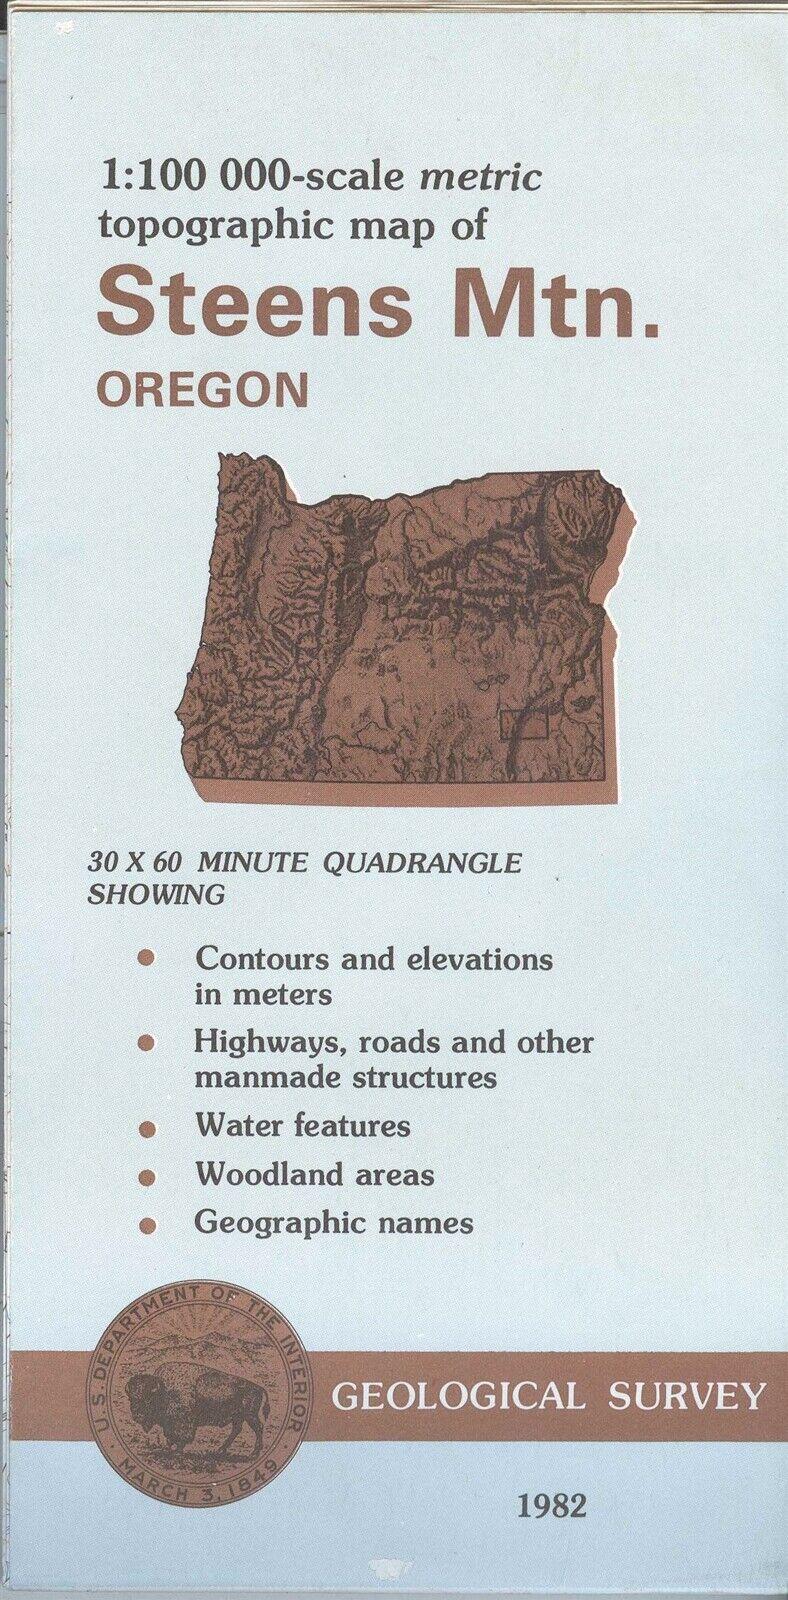 USGS Topographic Map STEENS MOUNTAIN Oregon 1982-100K